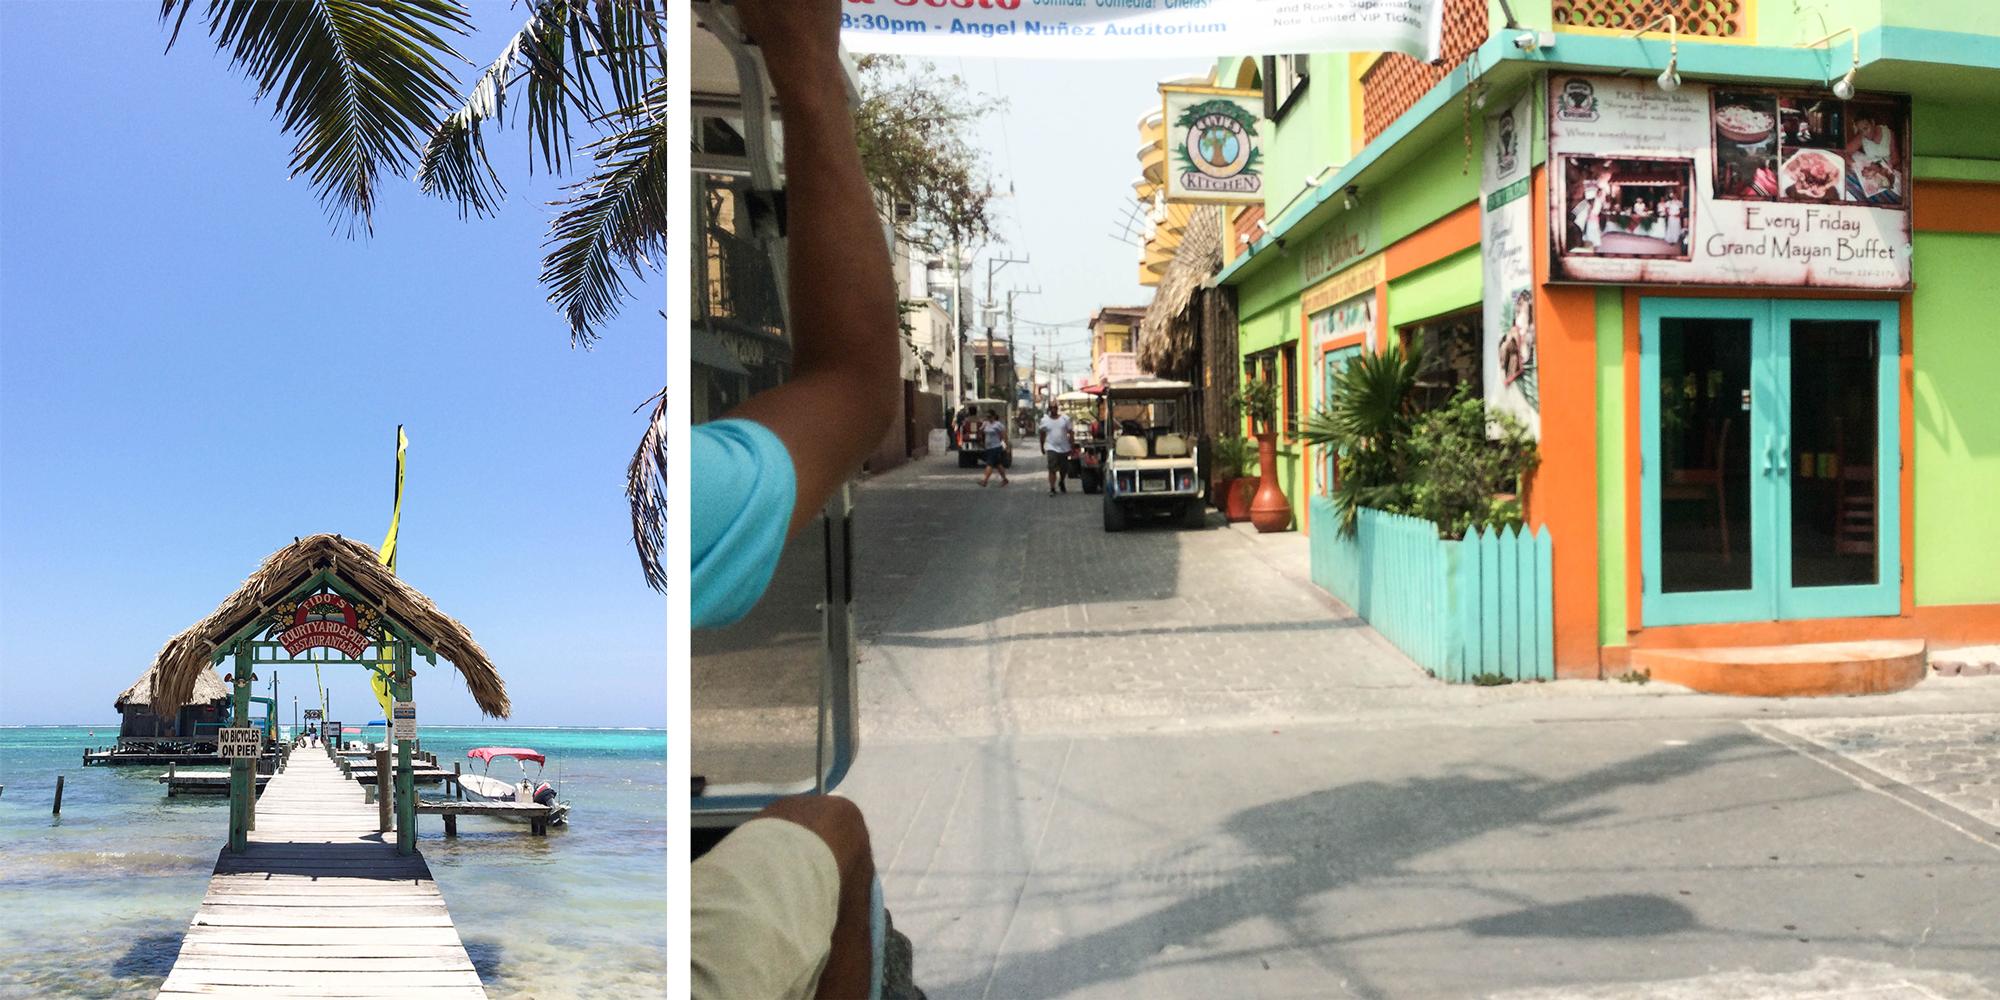 Above: San Pedro, Ambergris Caye via golf cart.